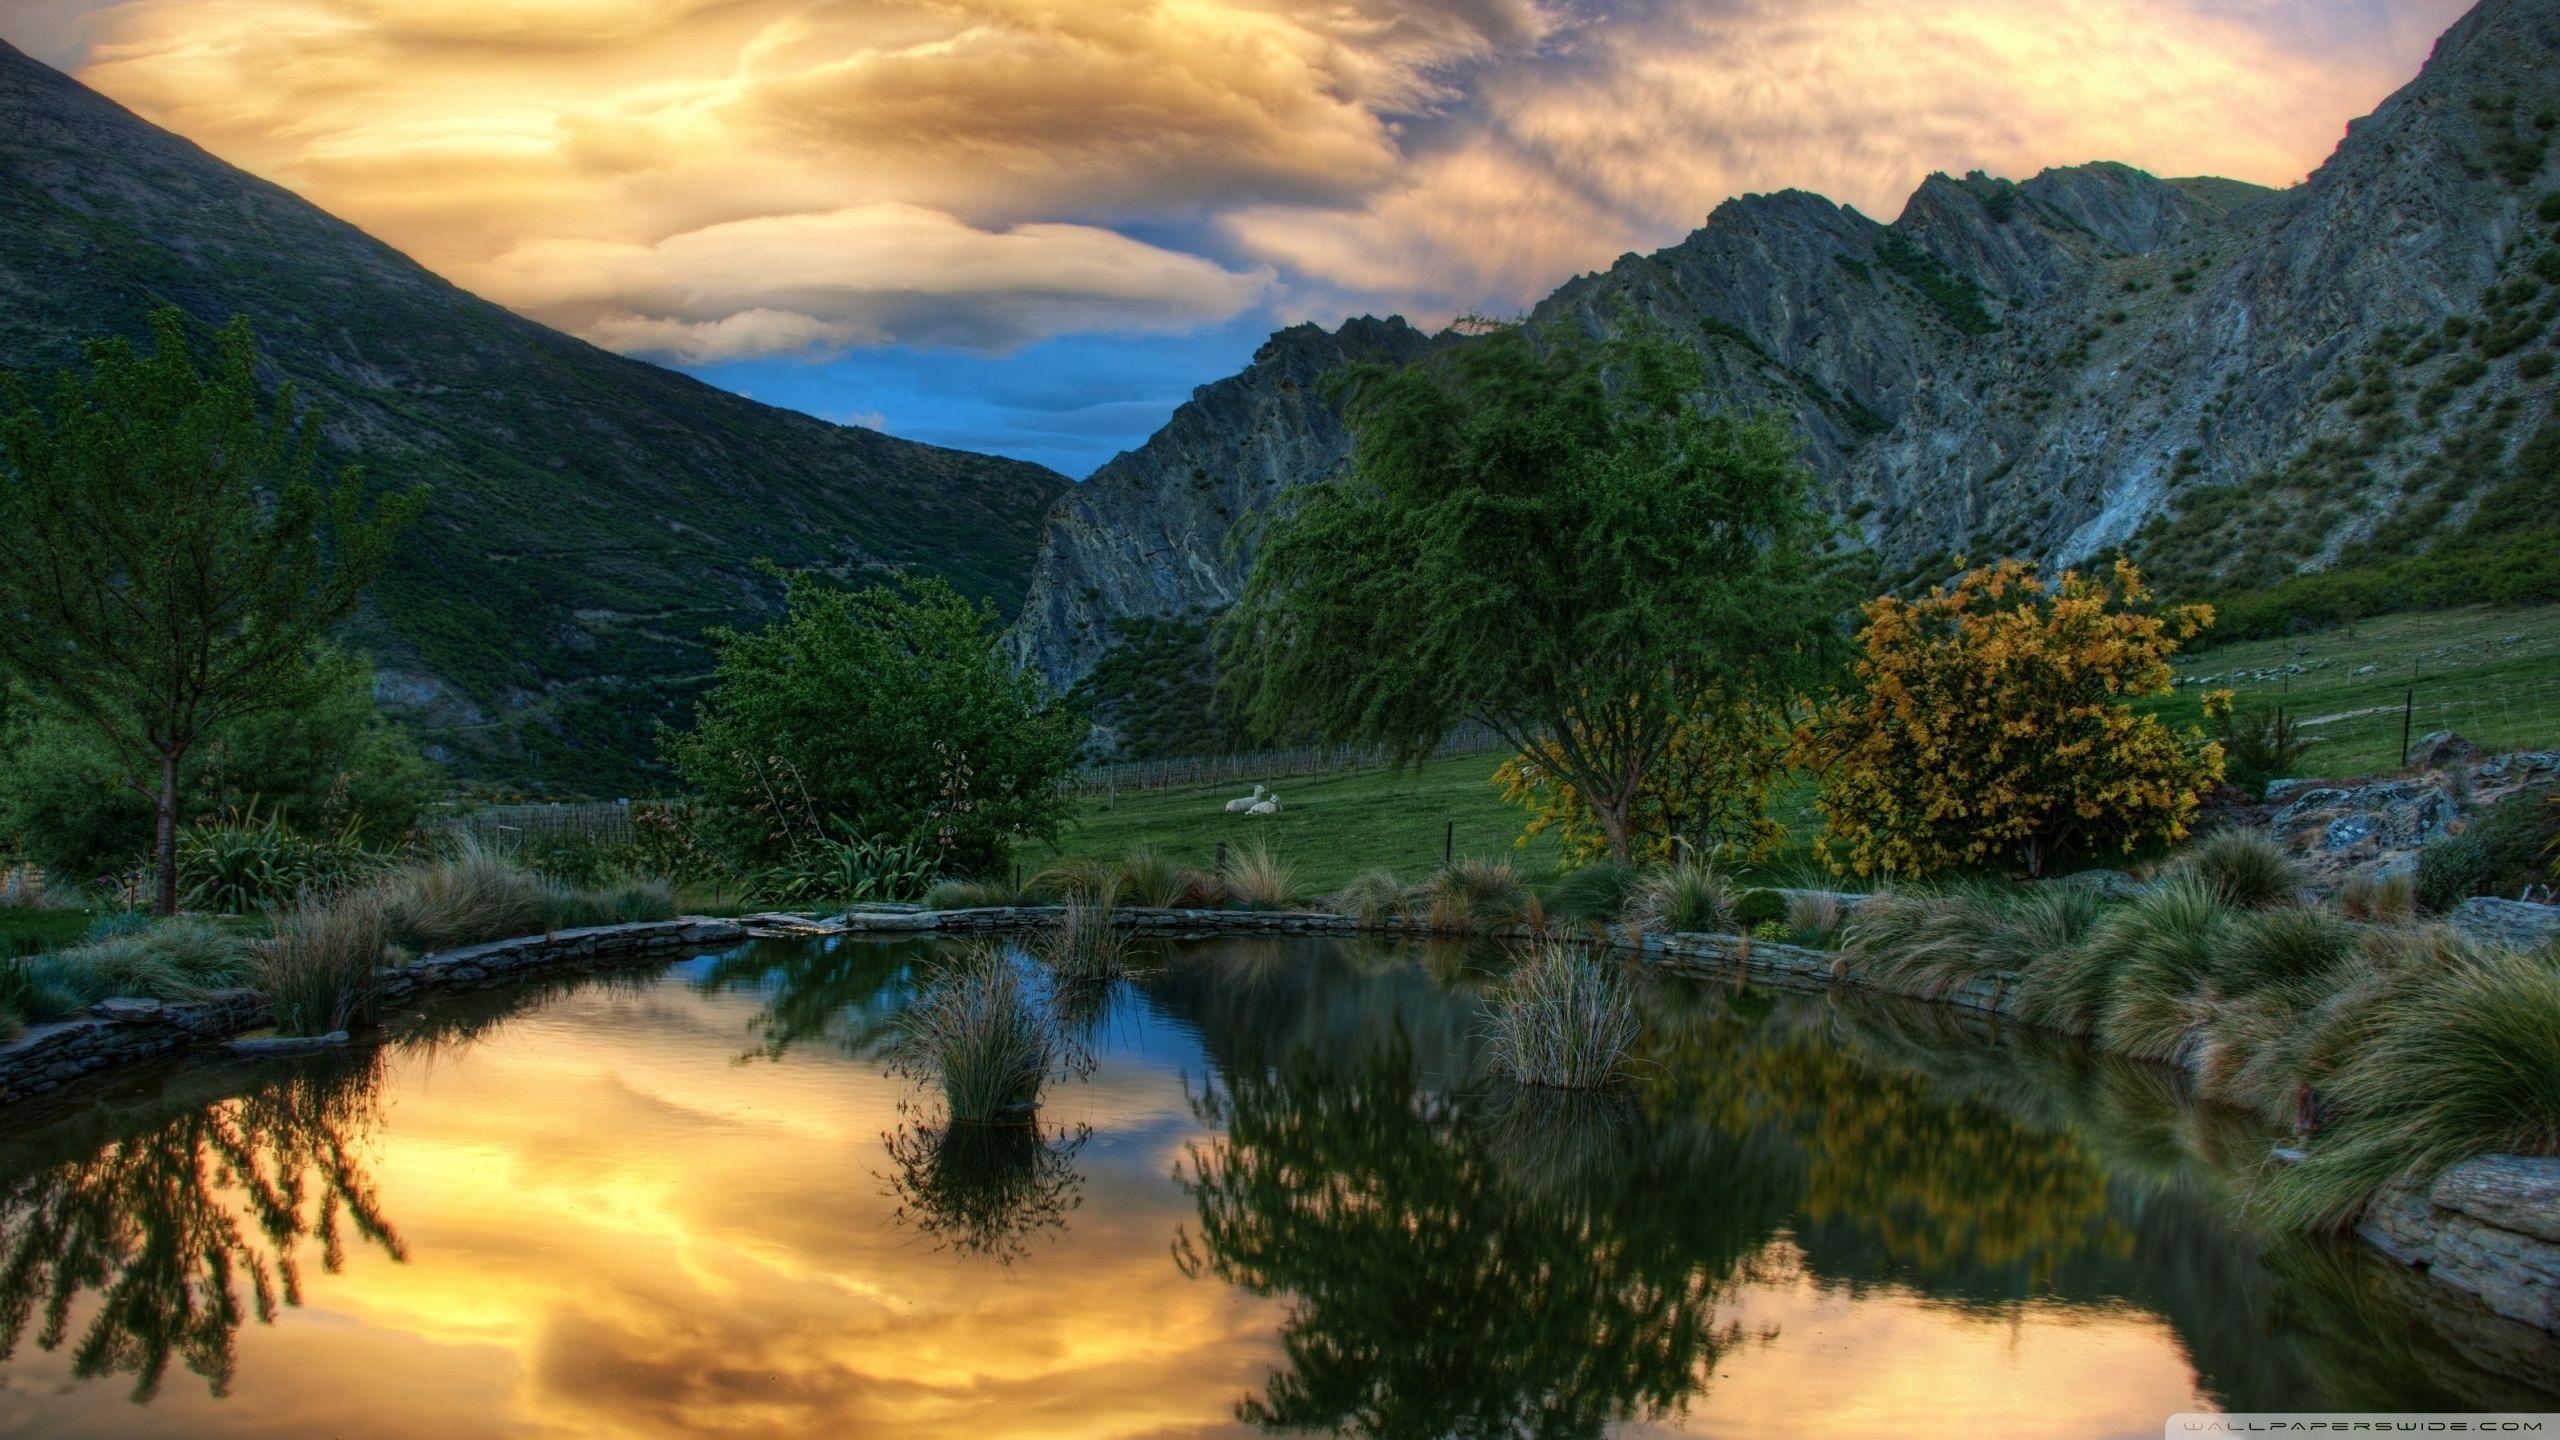 Pretty Landscape Wallpapers - Top Free Pretty Landscape ...